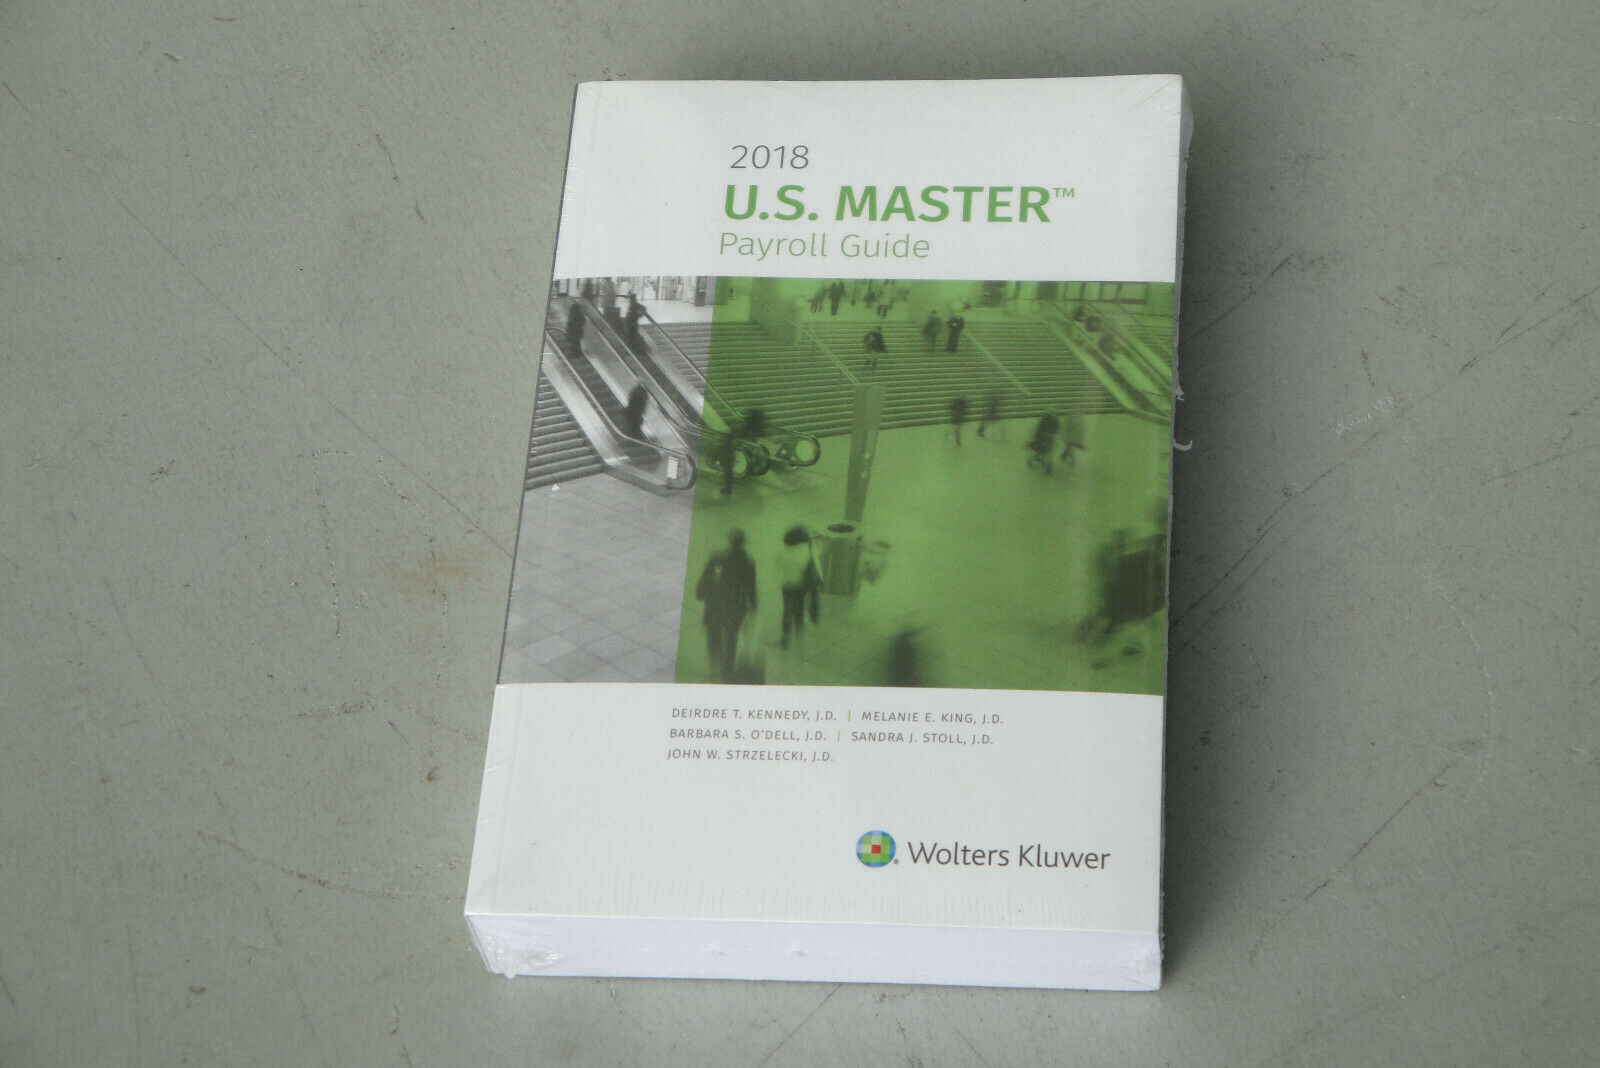 U. S. Master payroll guide 2017 edition pdf.